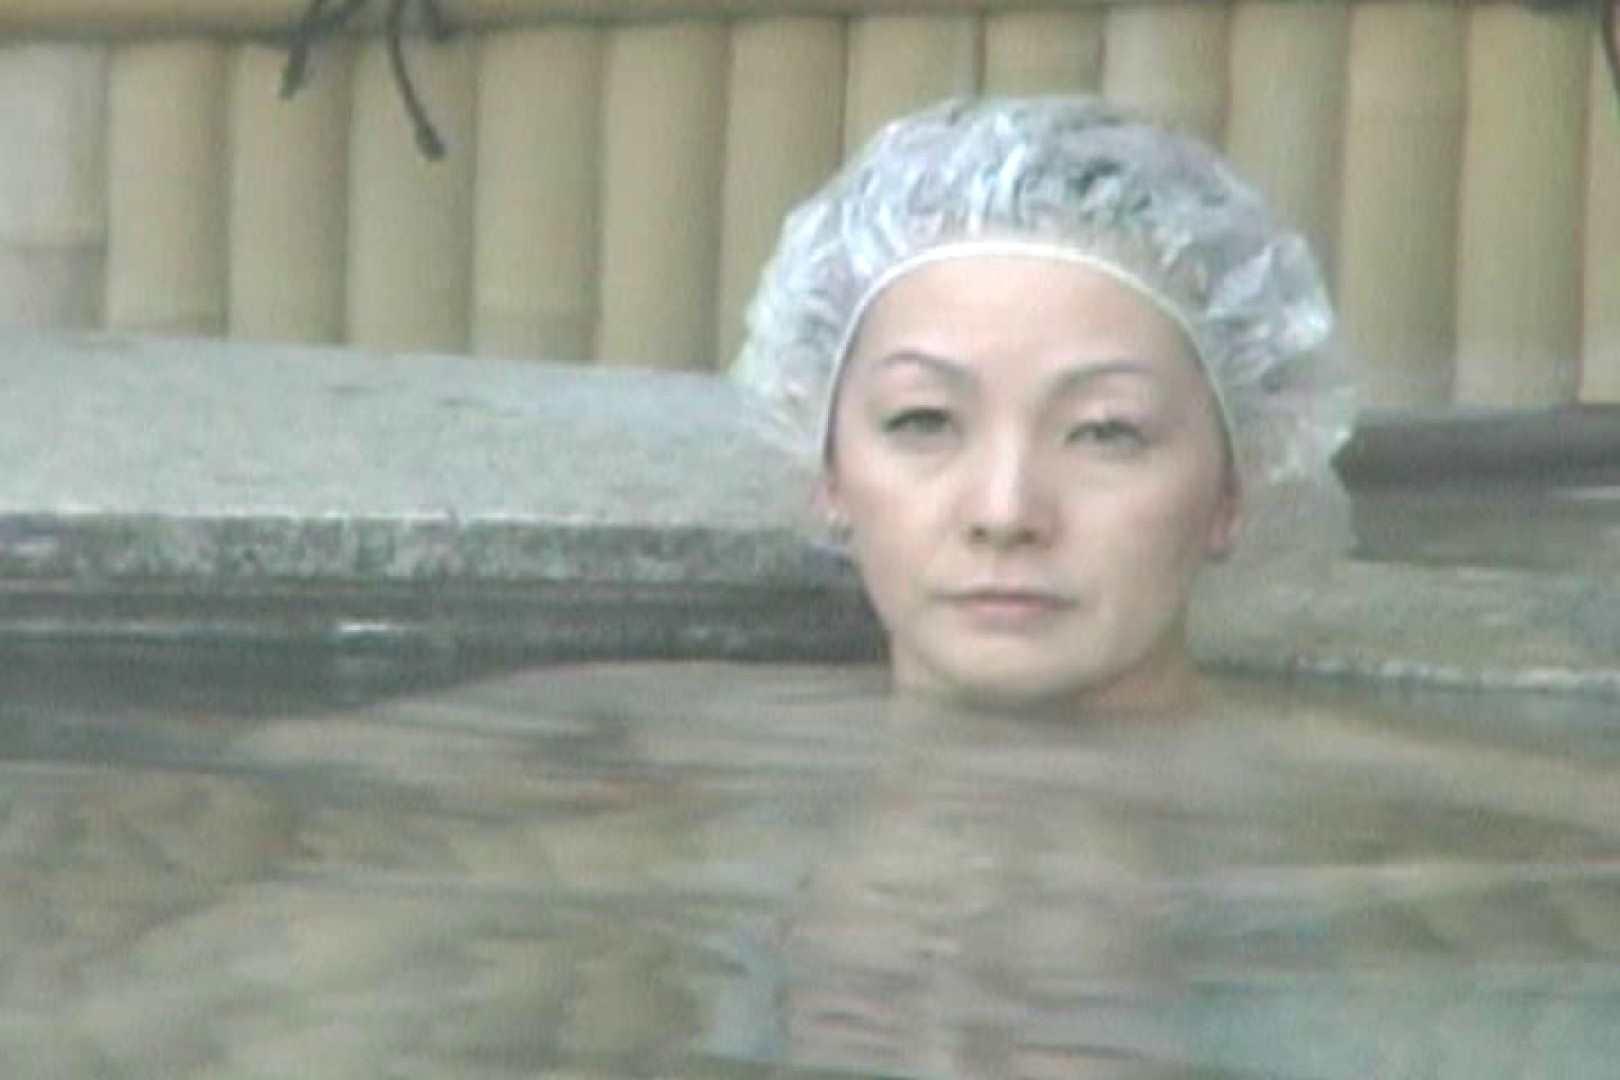 Aquaな露天風呂Vol.592 盗撮特撮 おまんこ動画流出 12pic 2